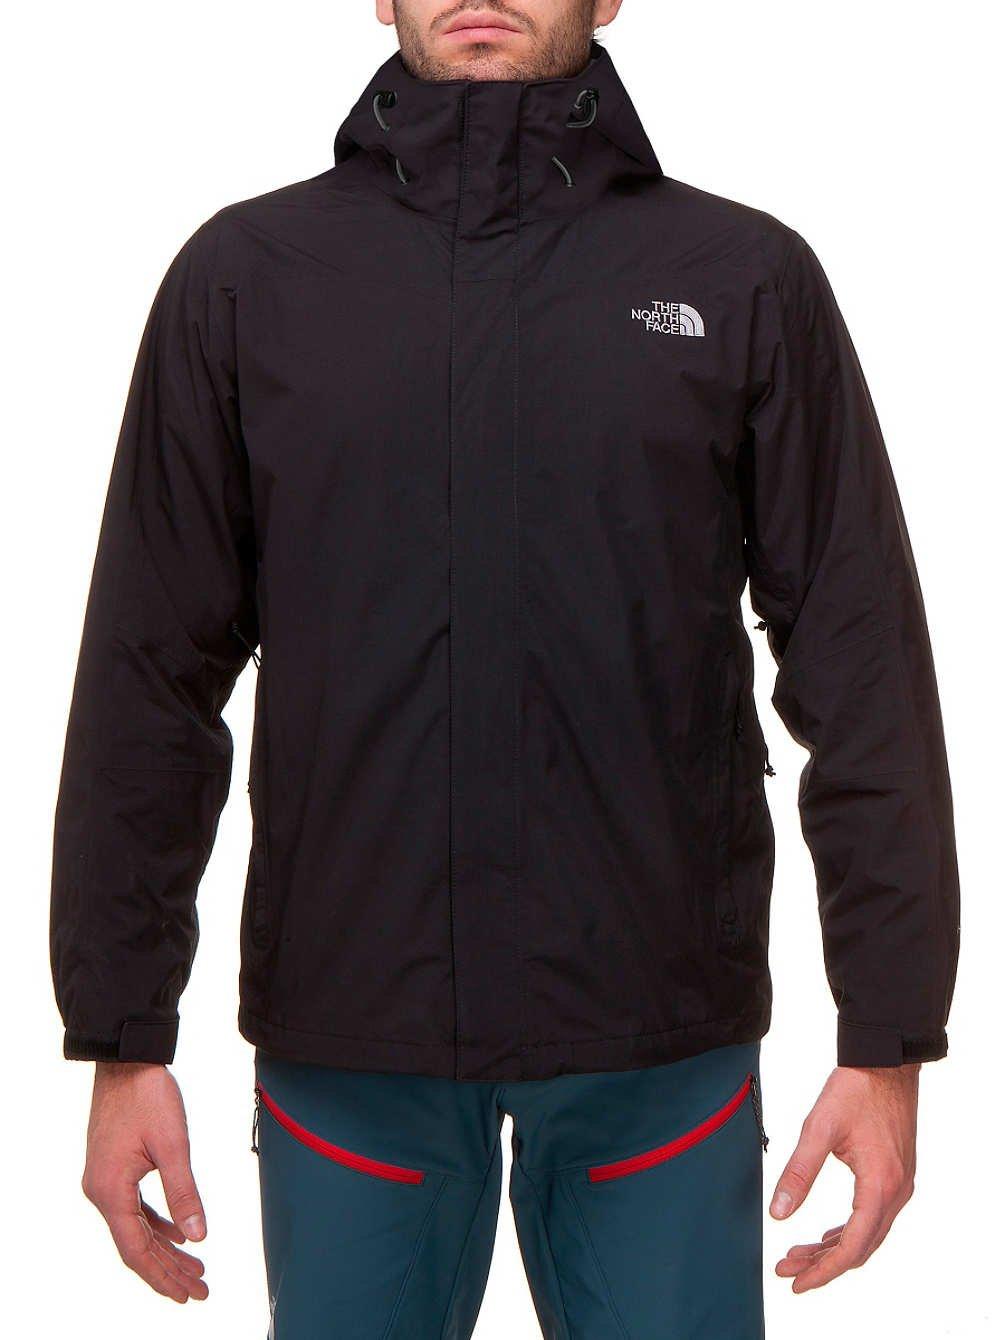 6957ee91ec The North Face Men's Evolve TriClimate Jacket (XXXL, TNF Black)